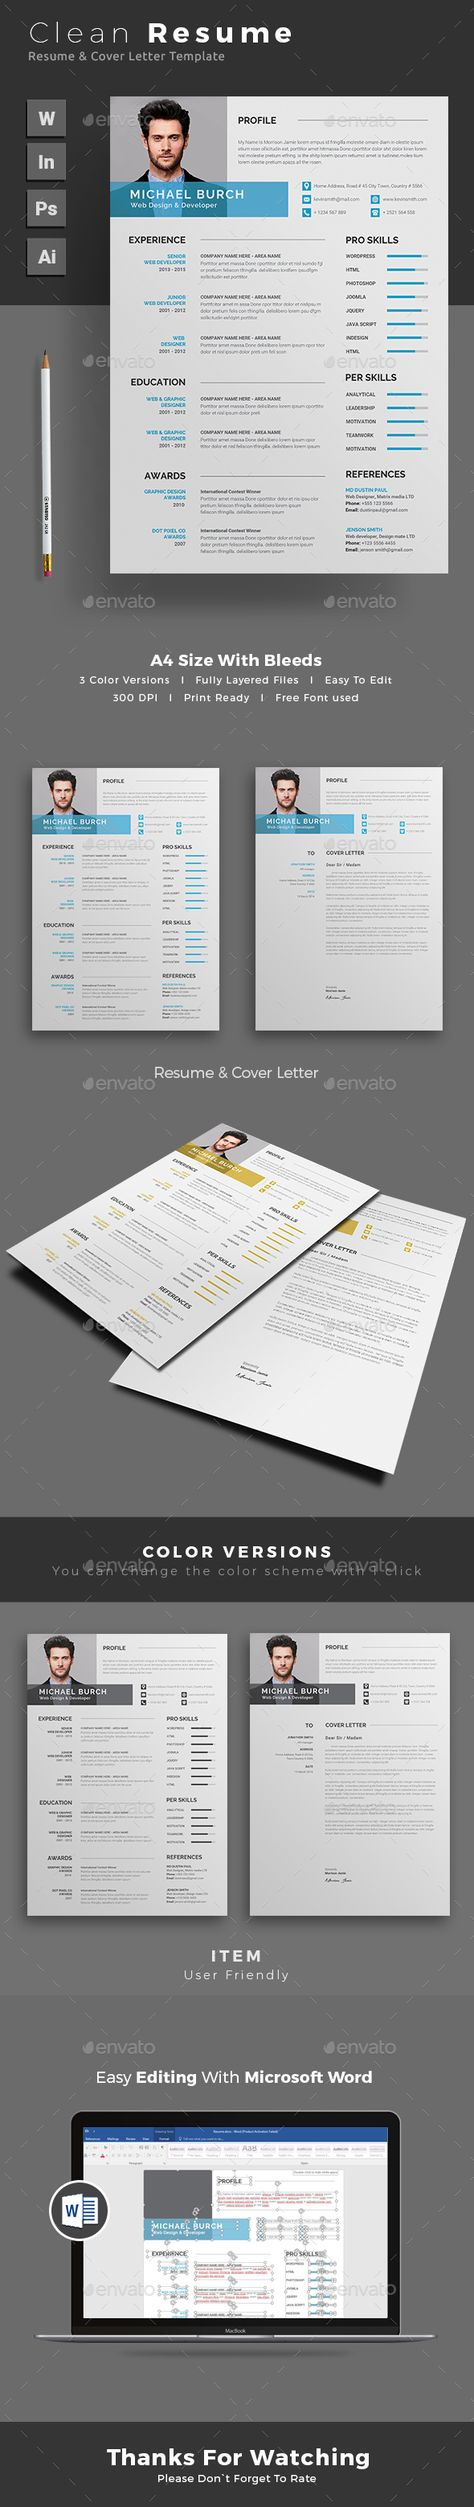 Free Professional Resume Letter u0026 Portfolio Templates